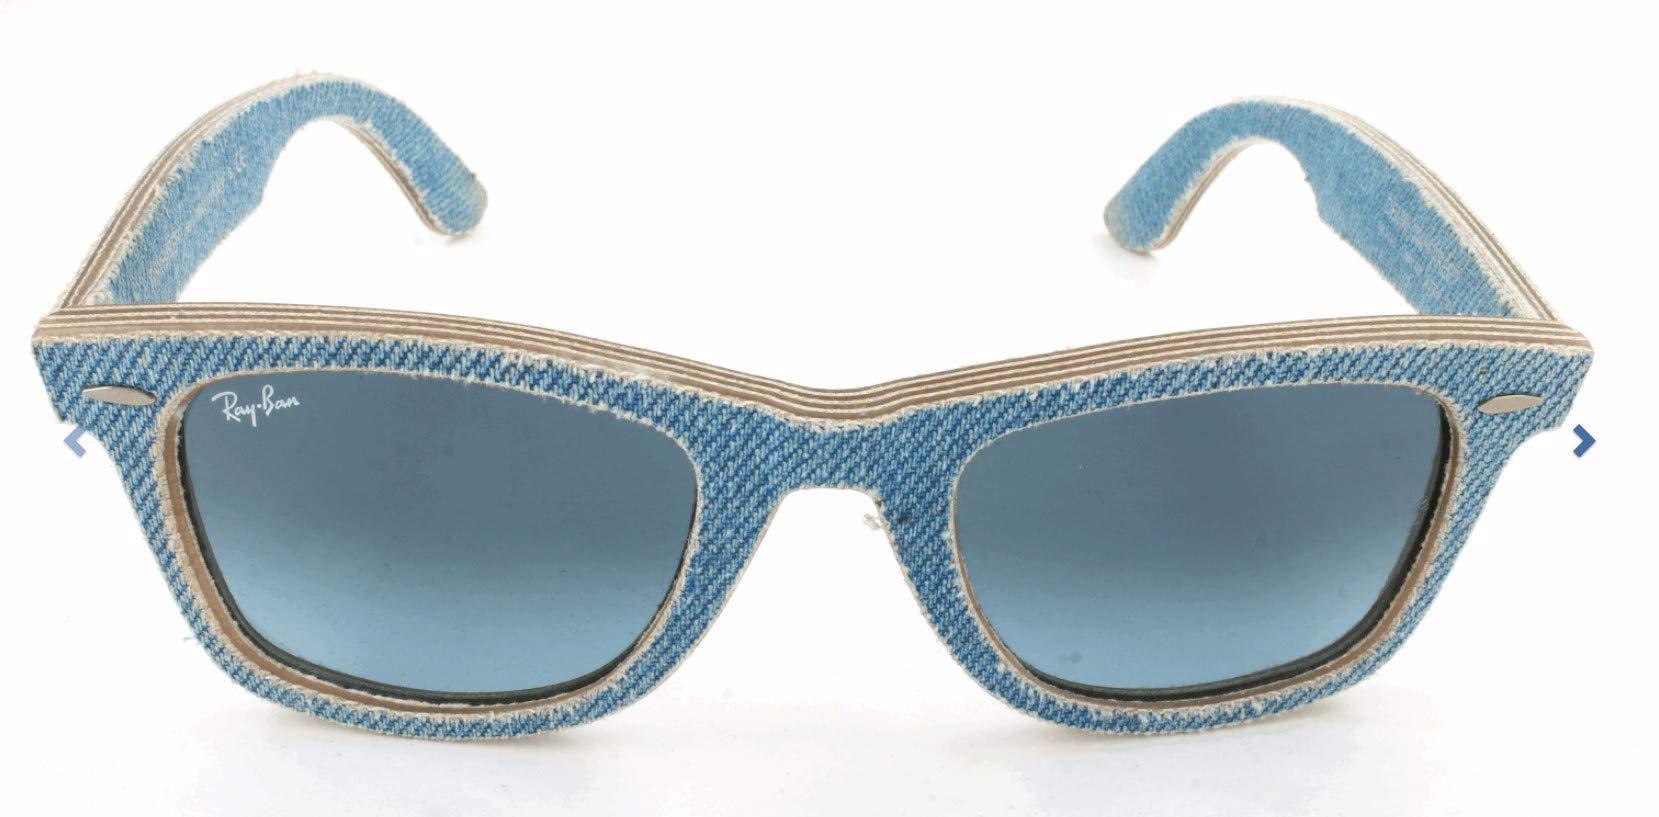 Ray-Ban RB2140 Wayfarer Sunglasses, Denim Light Blue, 50 mm